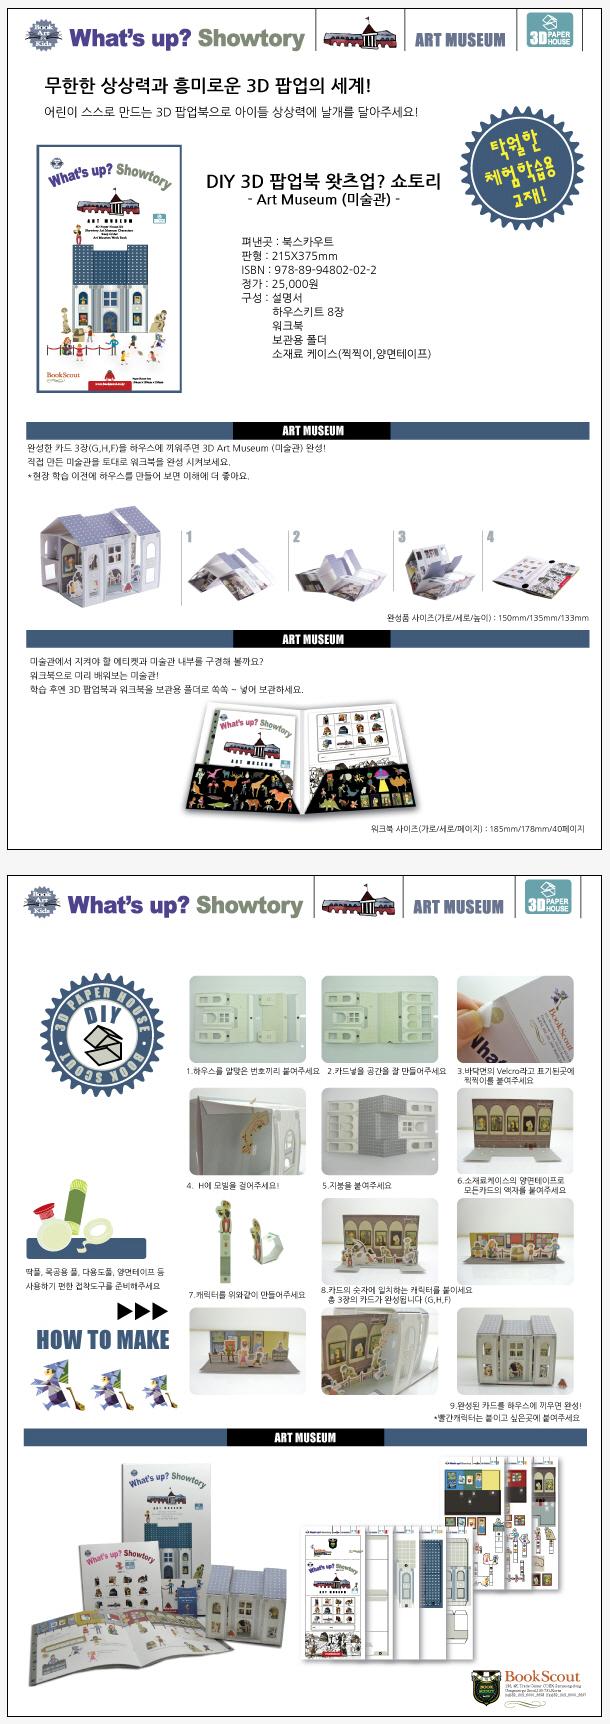 WHATS UP SHOWTORY: ART MUSEUM(왓츠업 쇼토리: 미술관)(3D팝업북)(팝업북) 도서 상세이미지